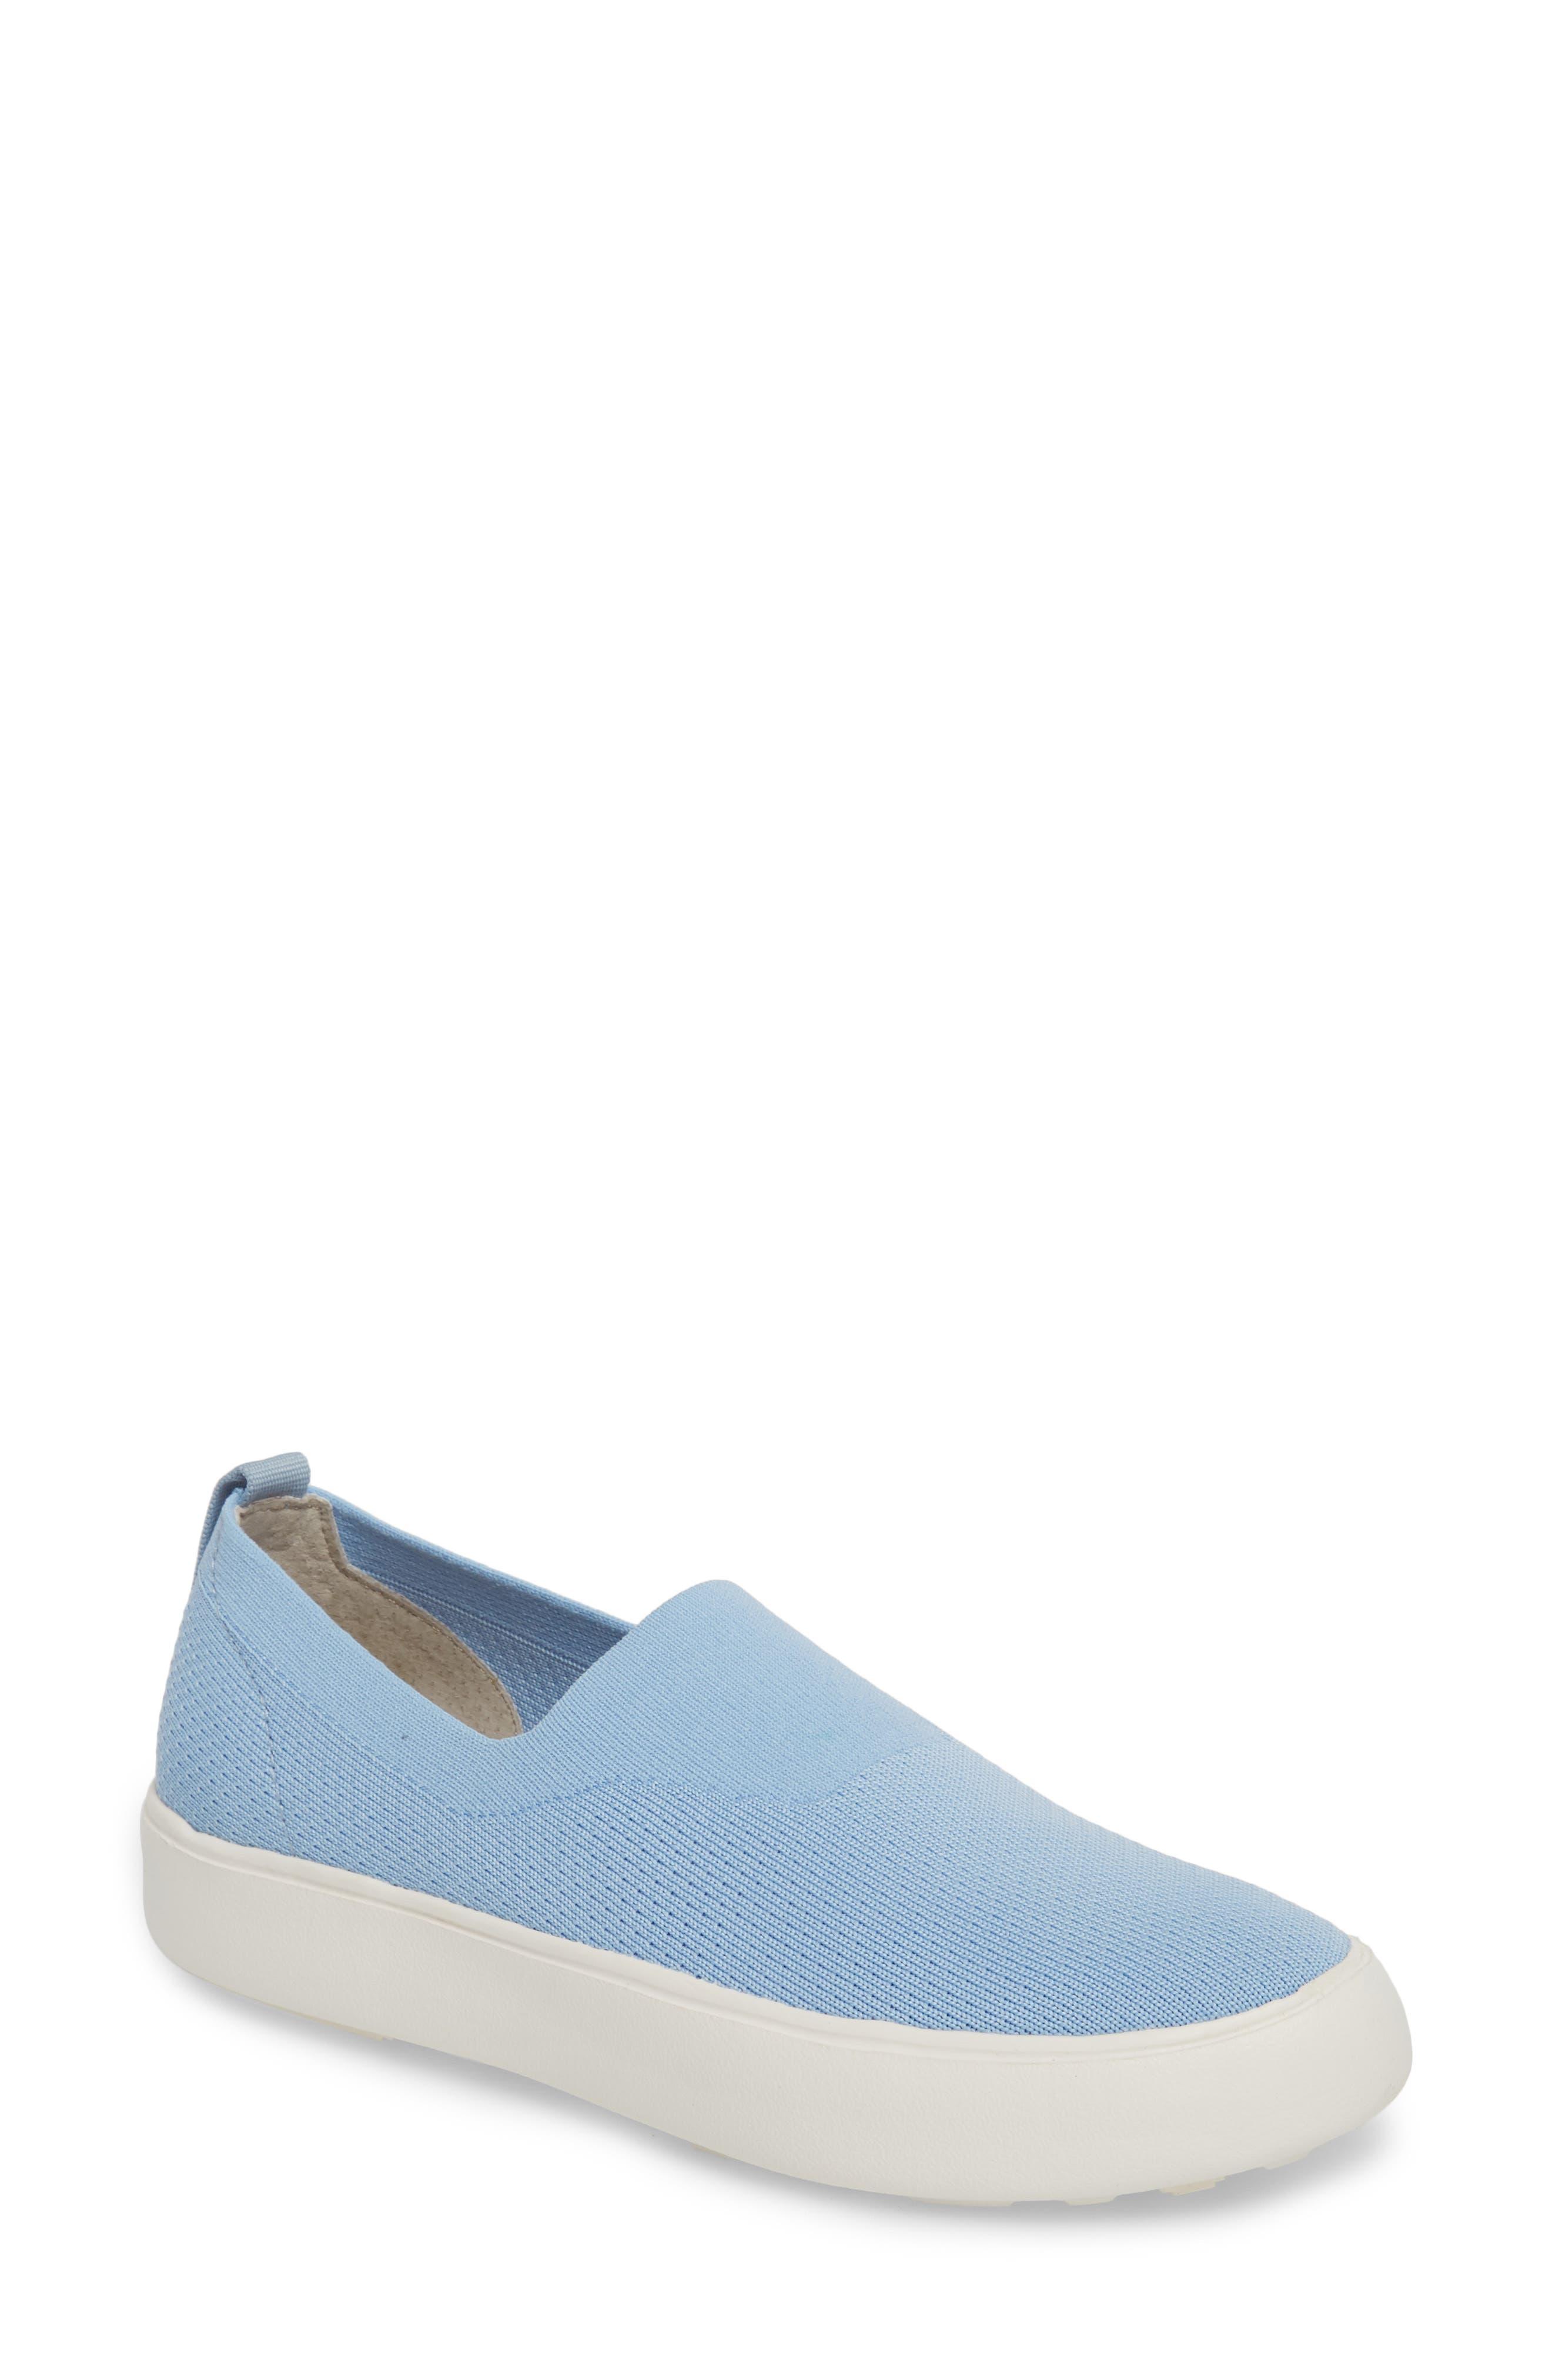 Hula Slip-On Sneaker,                             Main thumbnail 1, color,                             Fog Blue